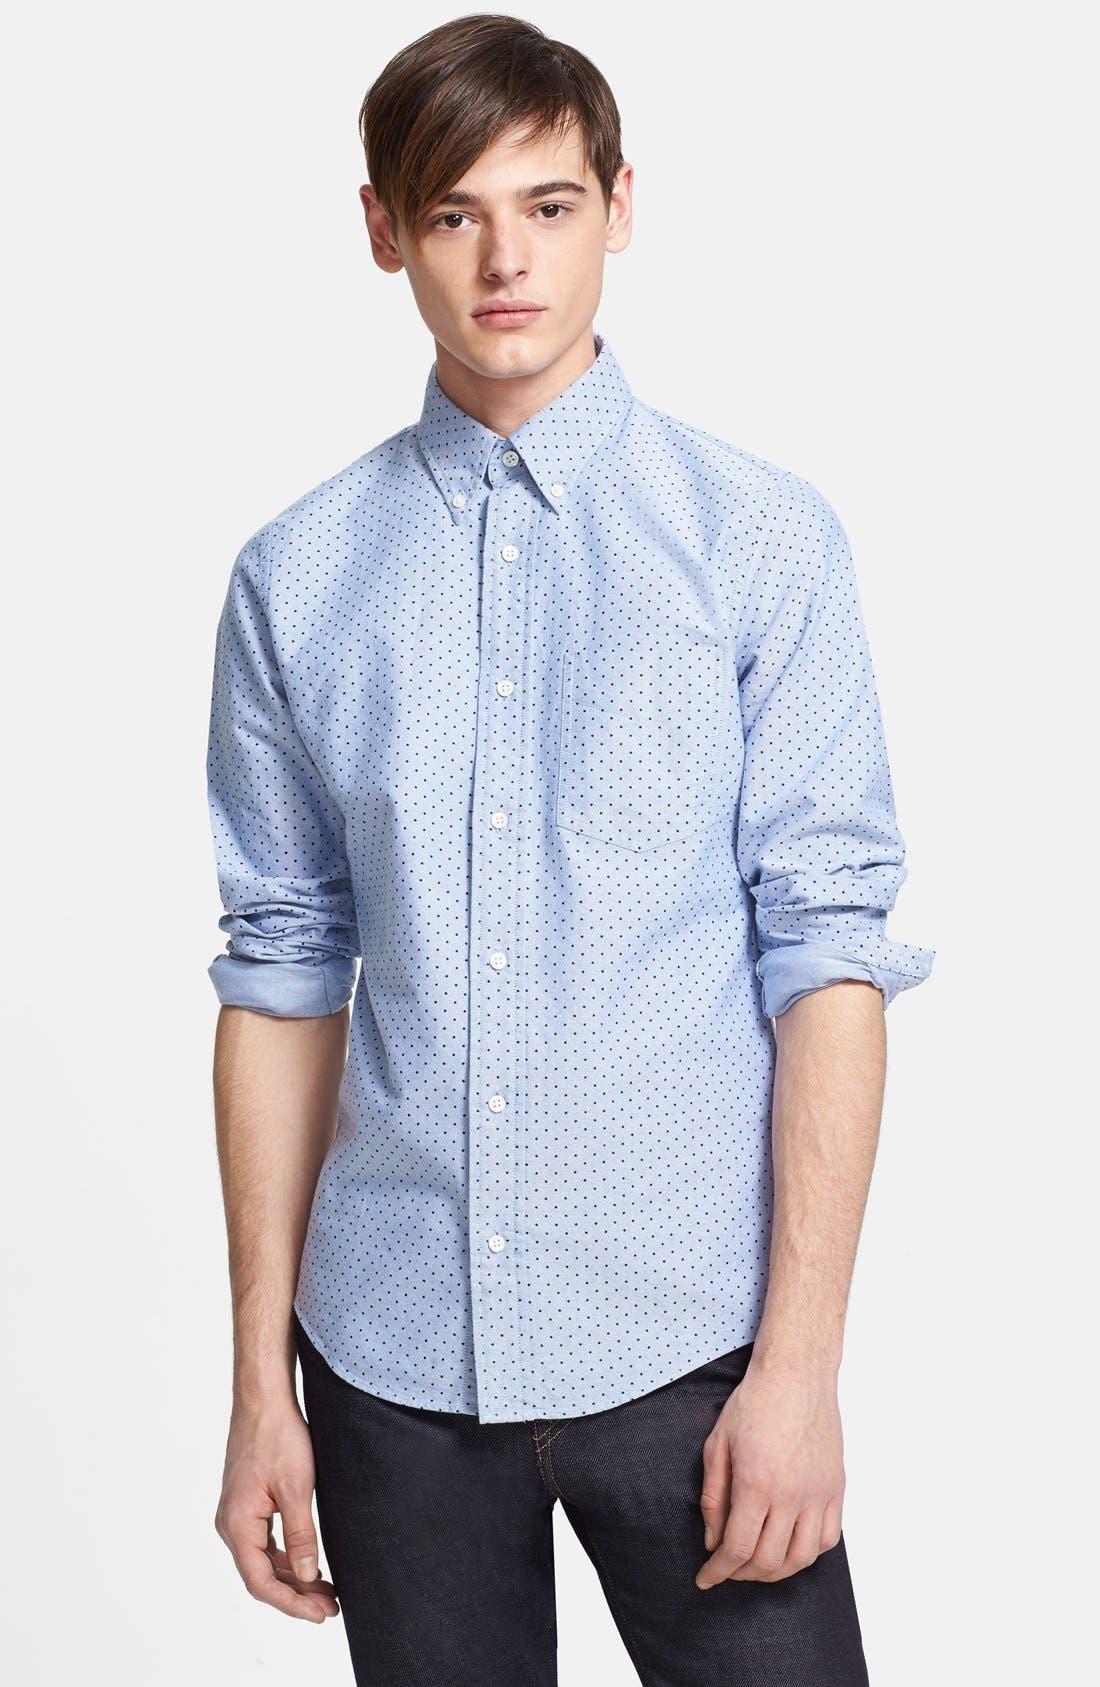 Main Image - Jack Spade 'Taylor' Dot Woven Oxford Sport Shirt